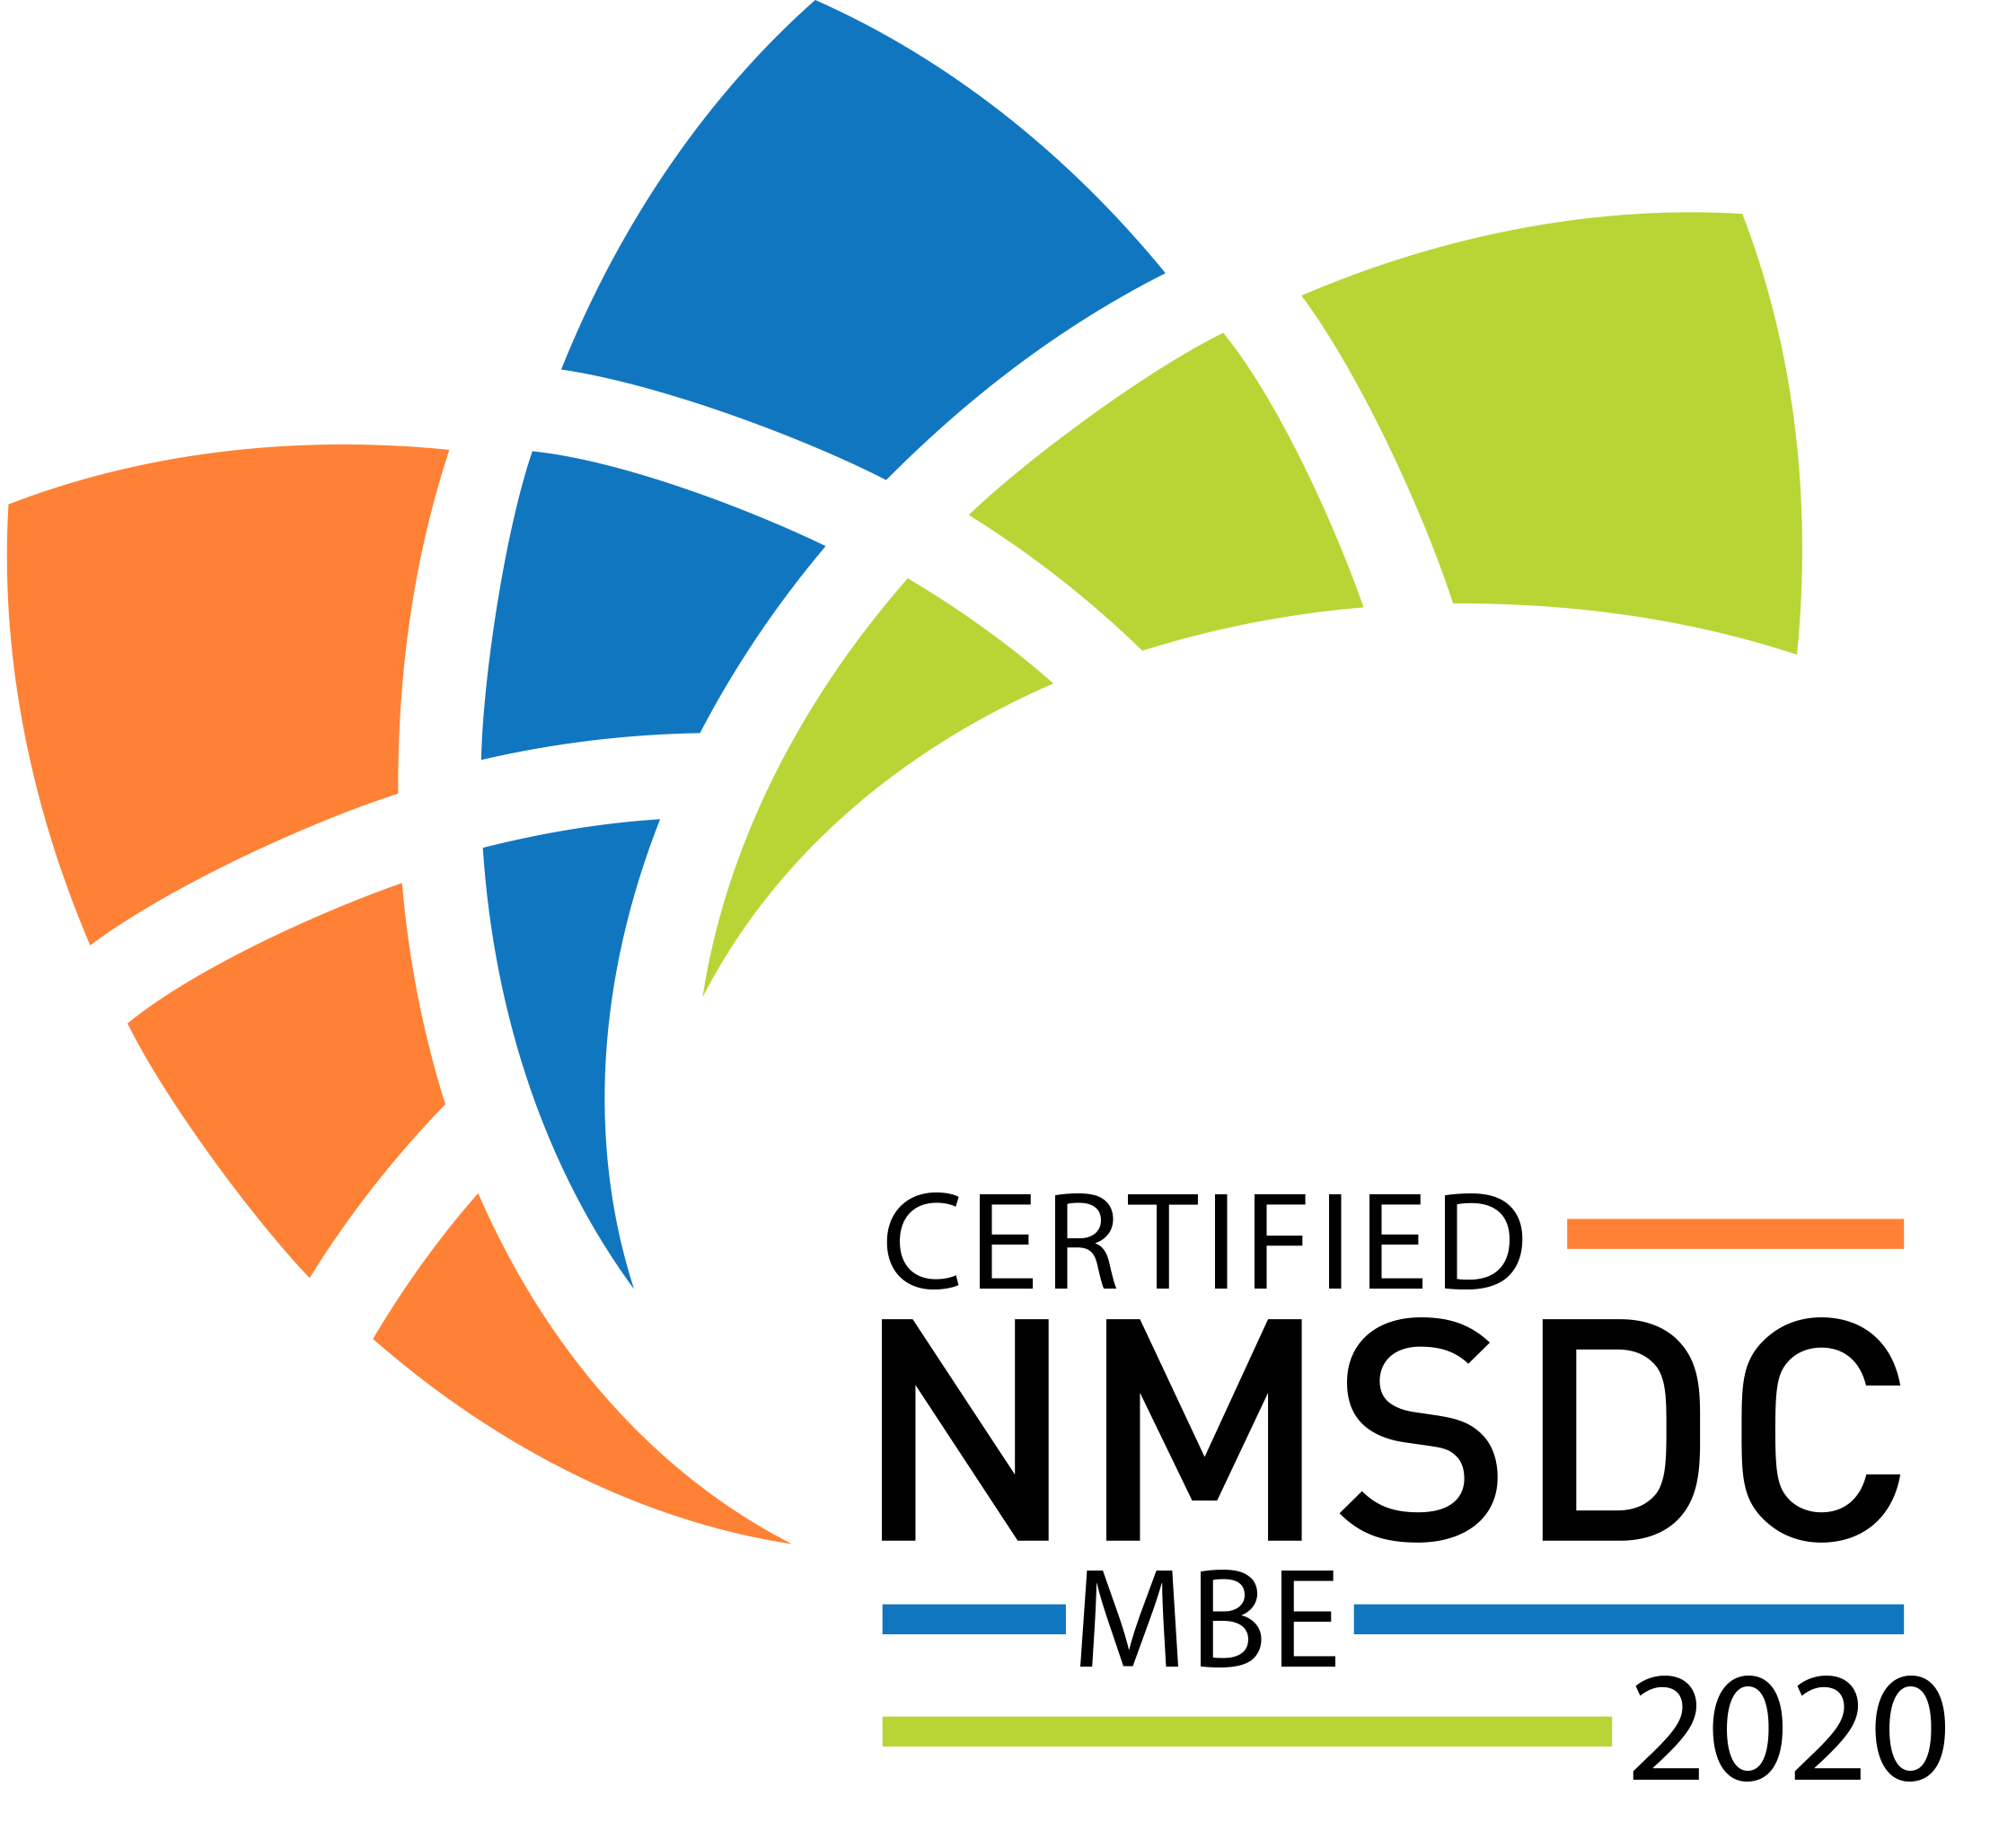 NMSDC certified Minority Business Enterprise 2020